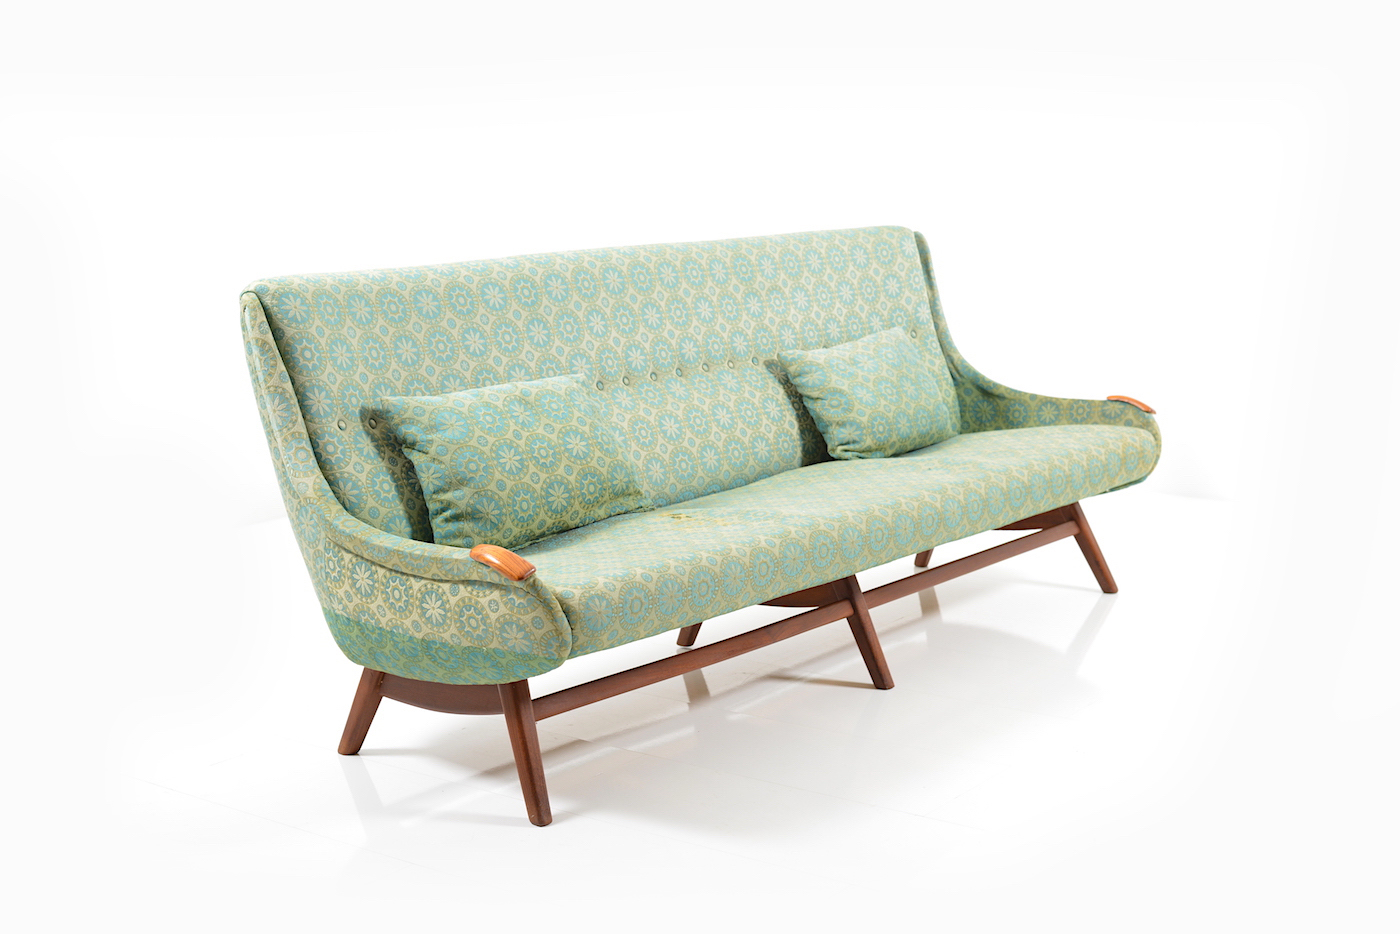 prototype sofa by svend skipper room of art. Black Bedroom Furniture Sets. Home Design Ideas